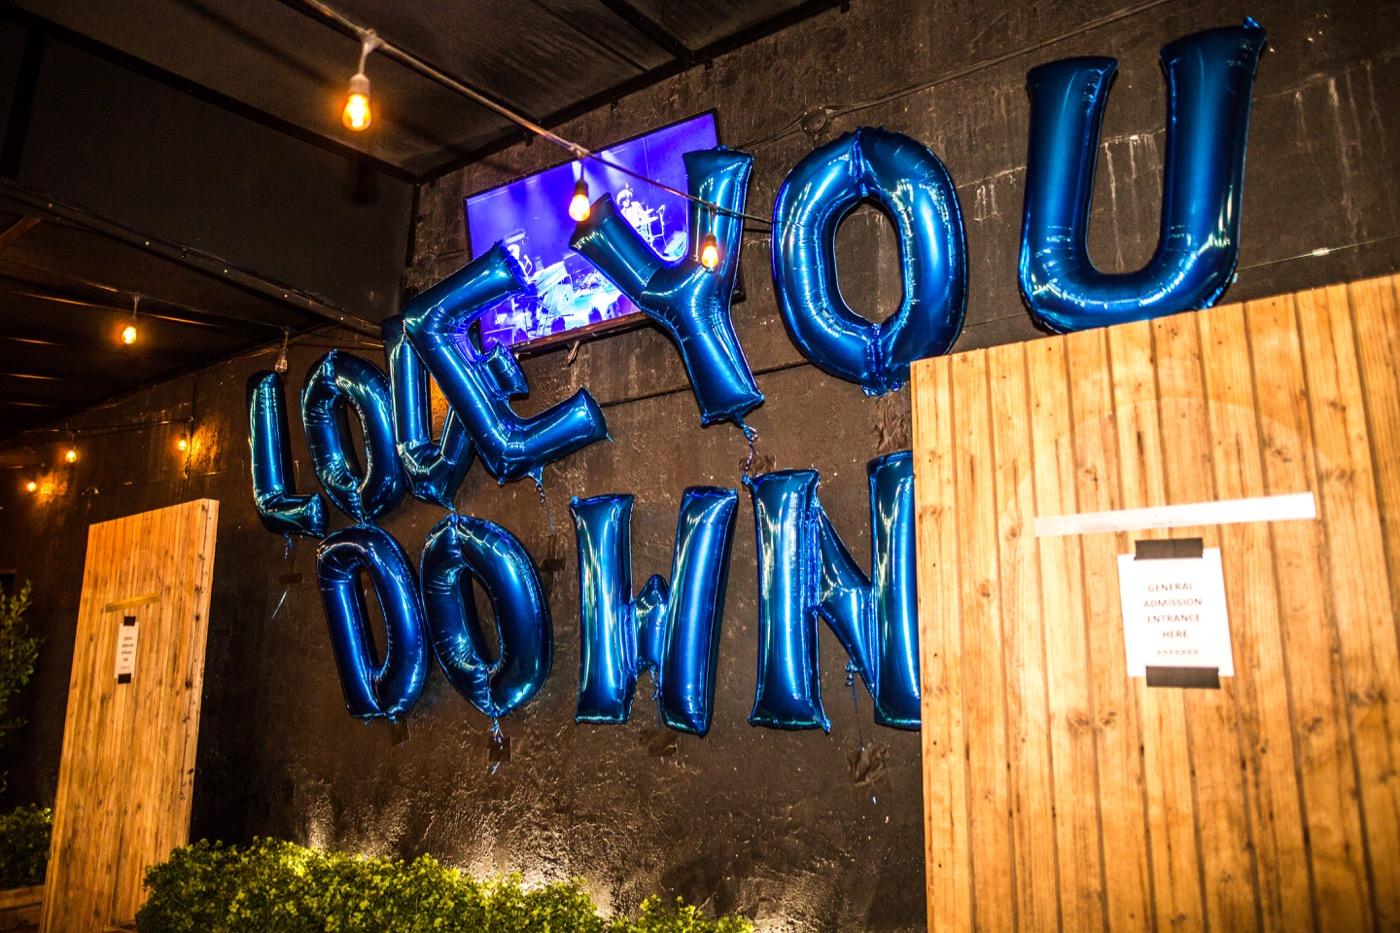 The Echoplex for Love You Down III 2/8/19. Photo by Derrick K. Lee, Esq. (@Methodman13) for www.BlurredCulture.com.